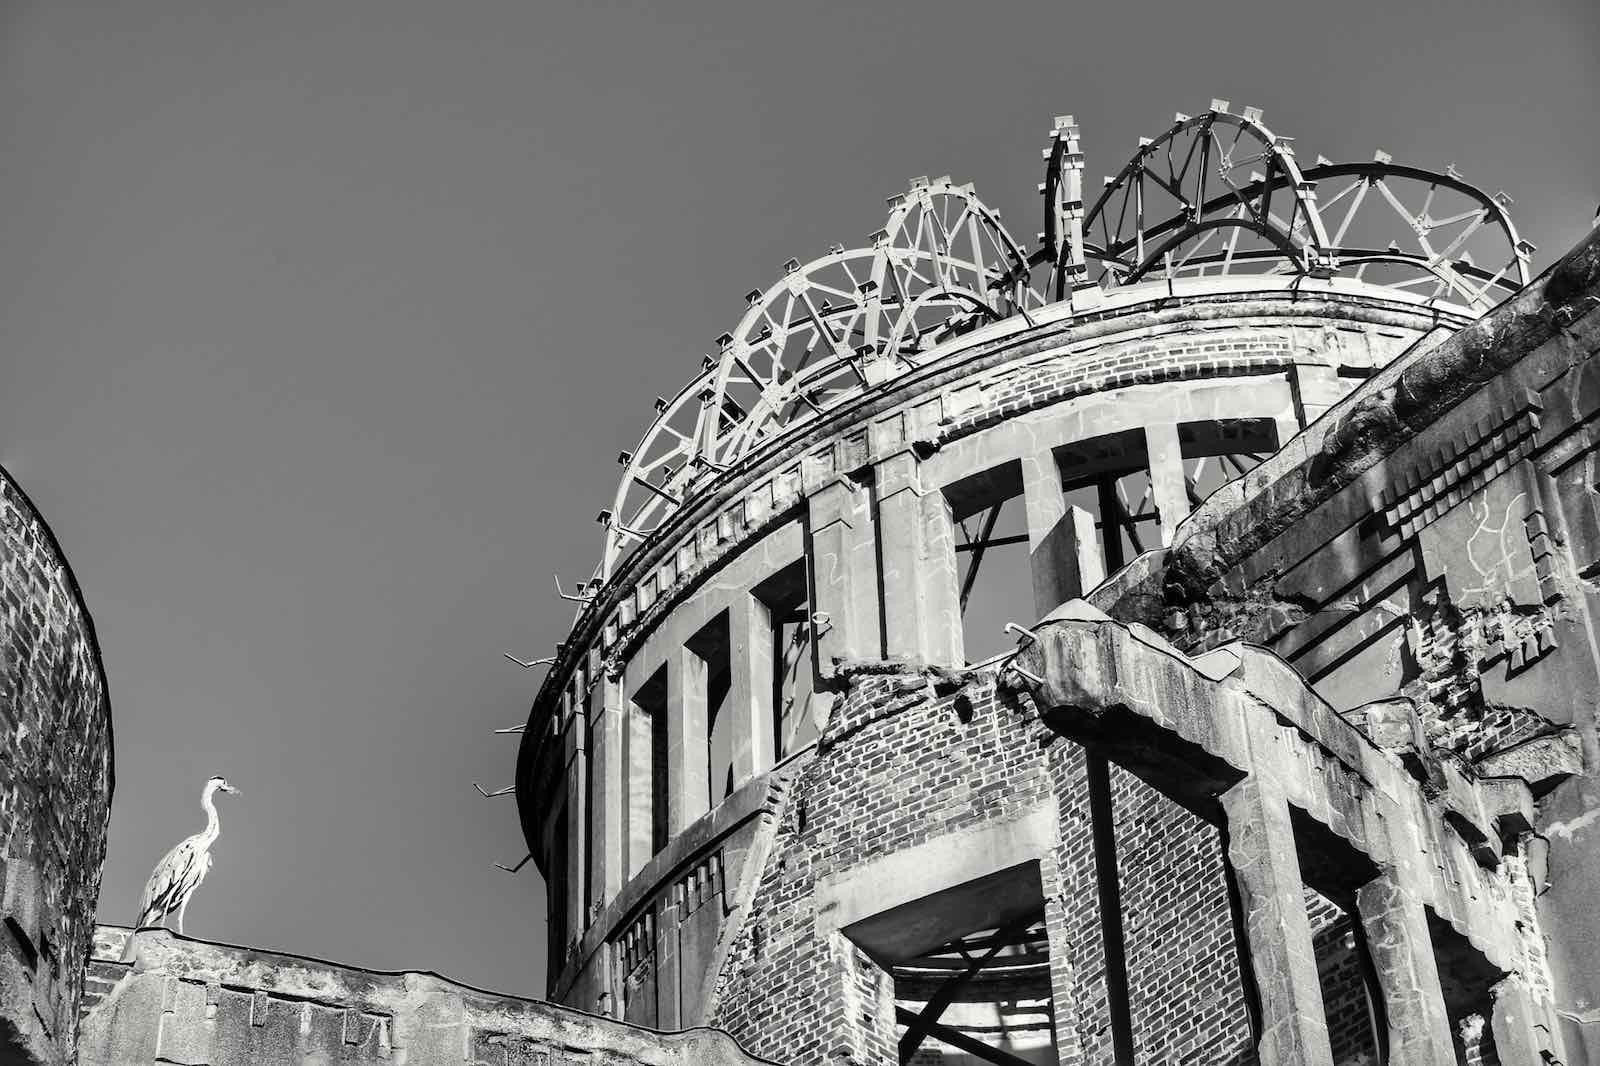 The Hiroshima Peace Memorial or Genbaku Dome, originally the Hiroshima Prefectural Industrial Promotion Hall (Mark Gunn/Flickr)